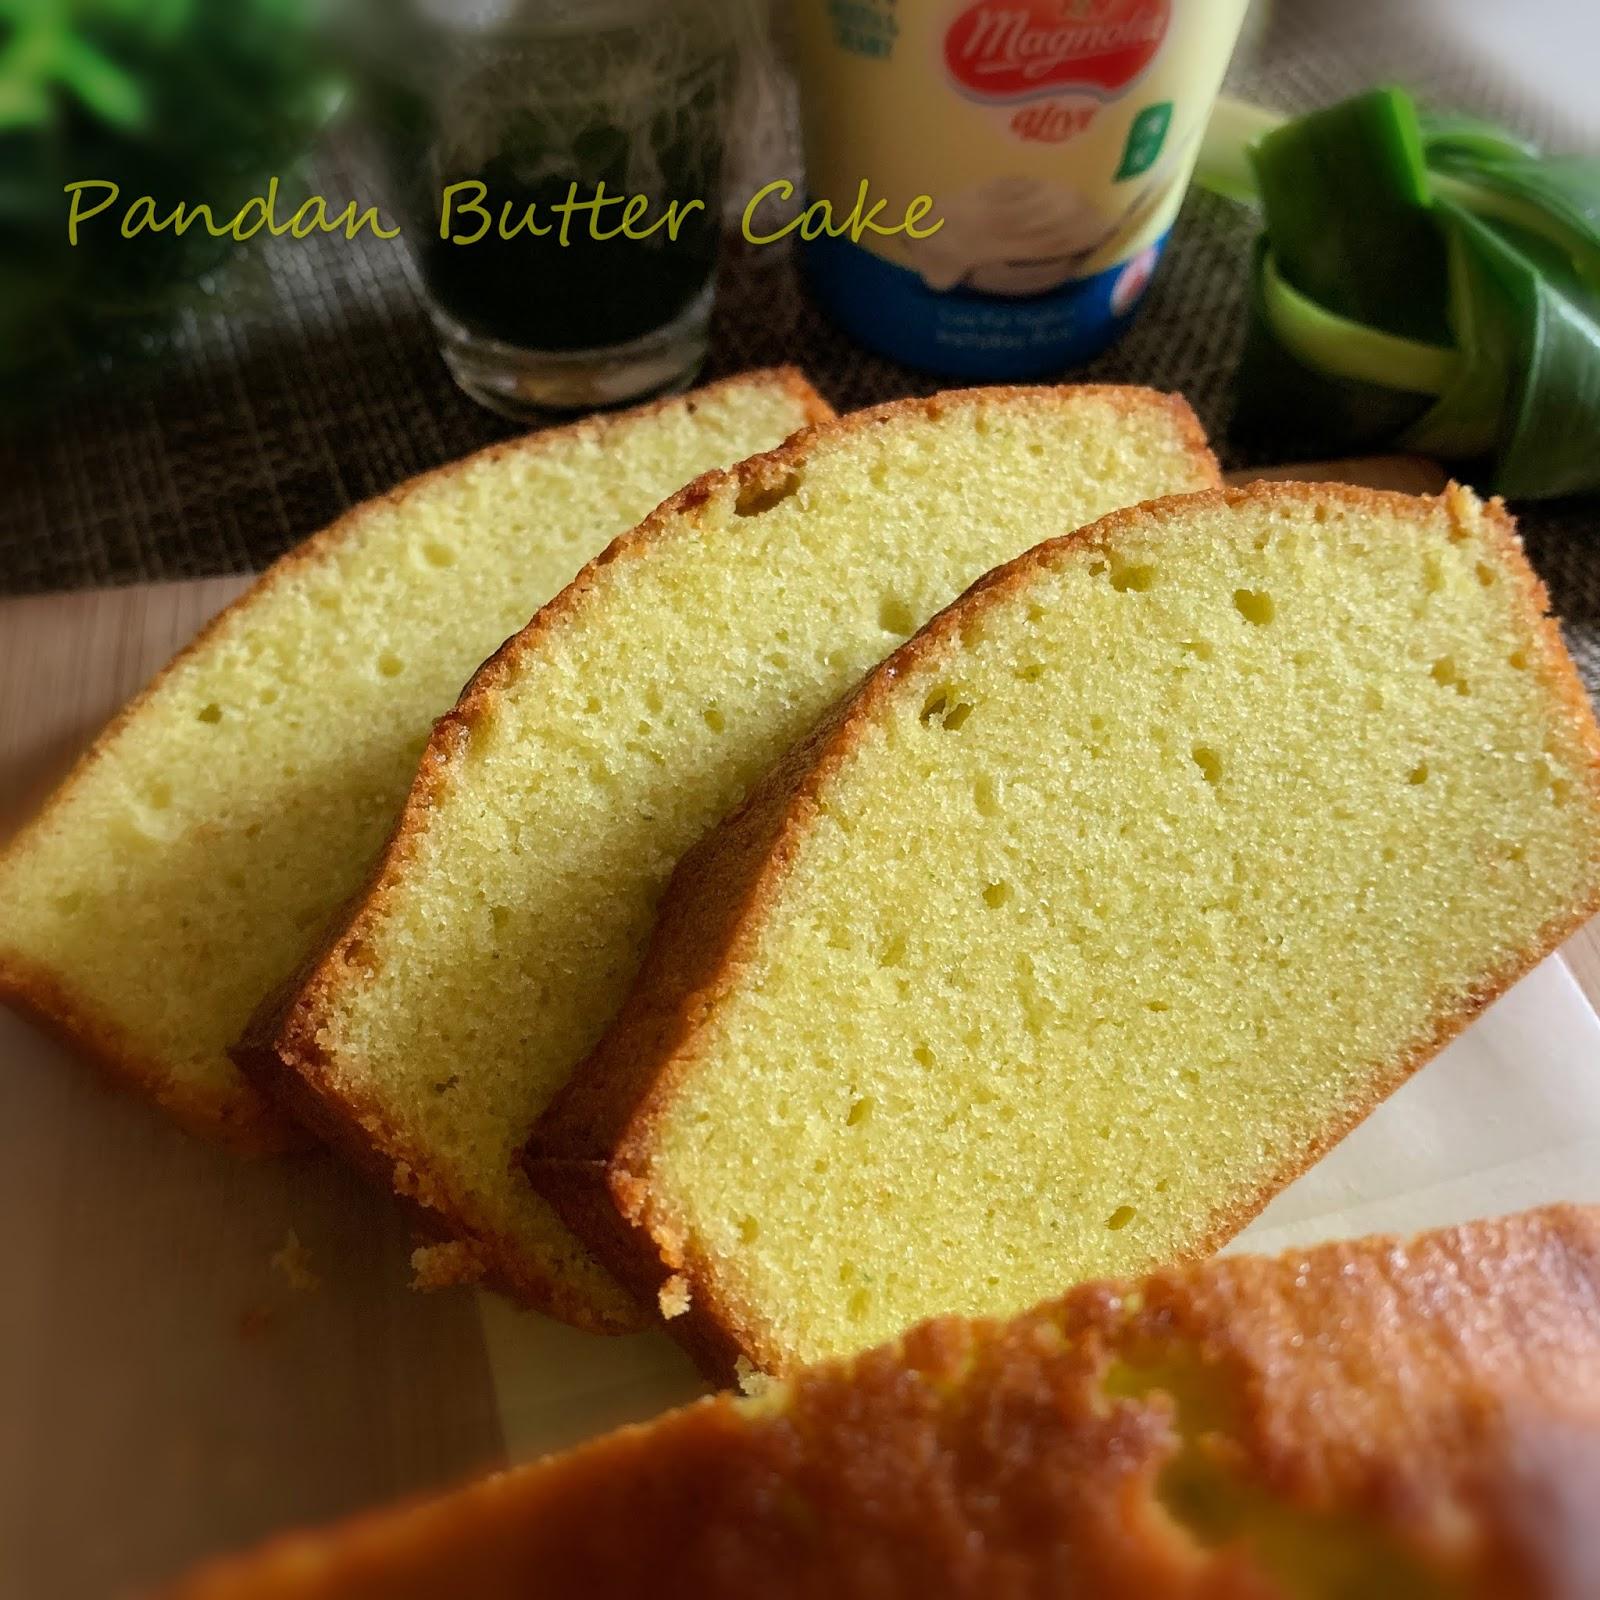 My Mind Patch Pandan Butter Cake 香兰牛油蛋糕